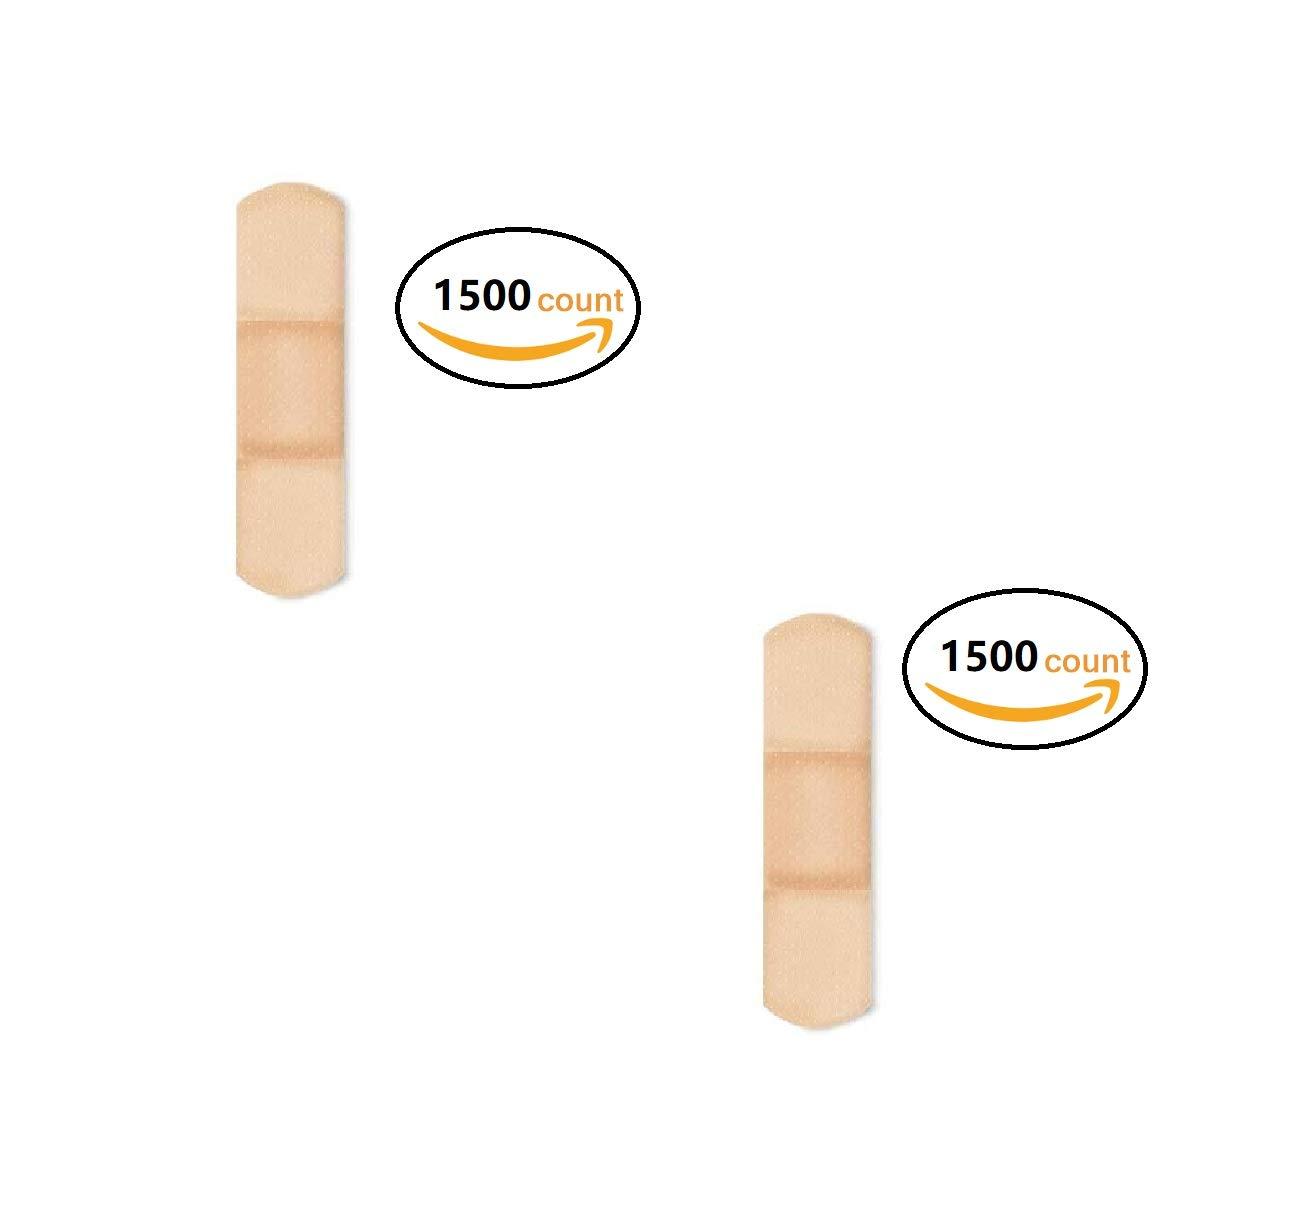 American White Cross 1304000 Sheer Adhesive Strips, Sterile, 3/4'' x 3'' Bulk, (2 Pack (1500 Count))